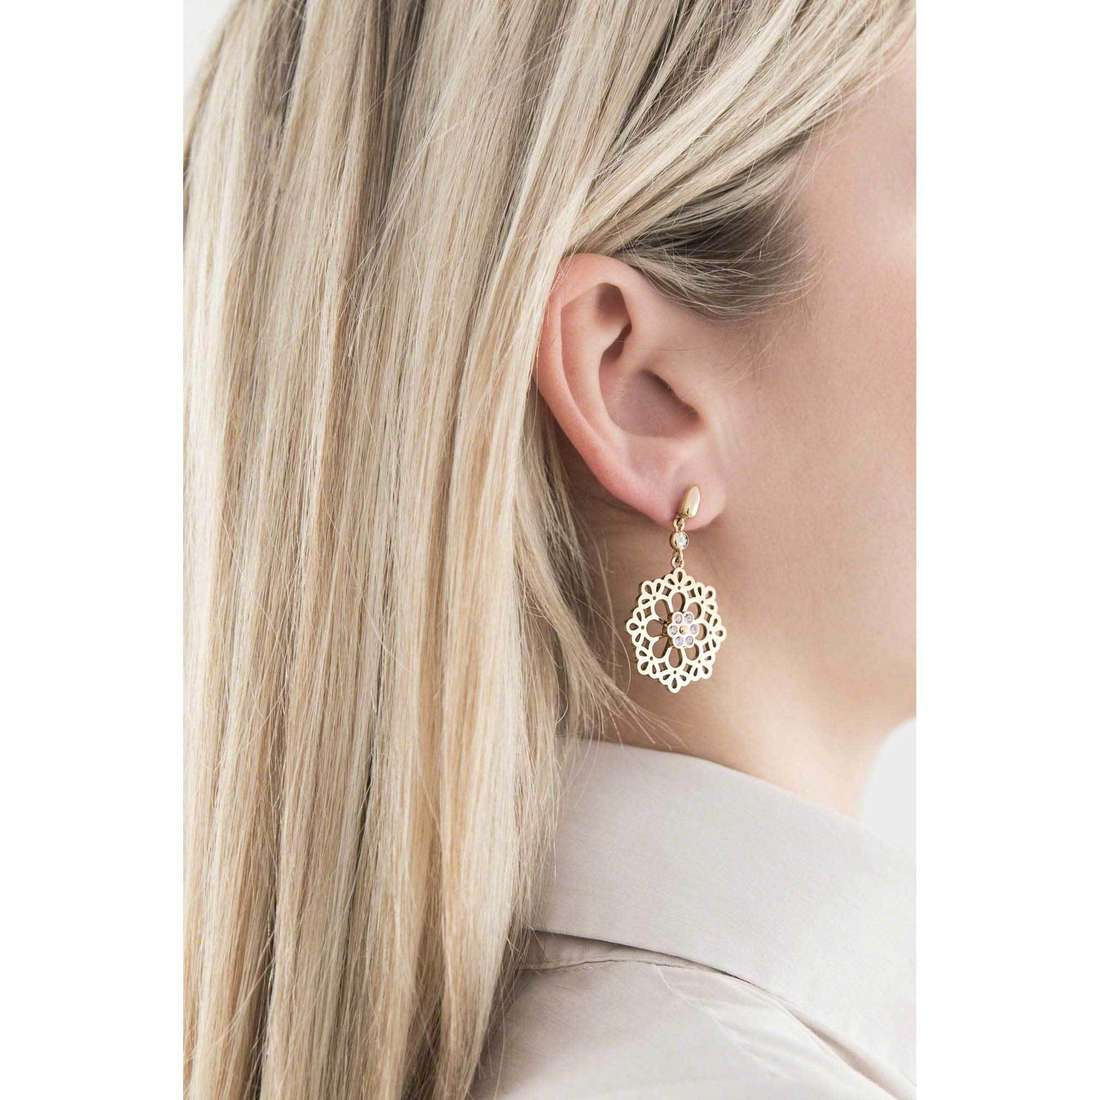 Morellato boucles d'oreille Kaleido femme SADY03 indosso